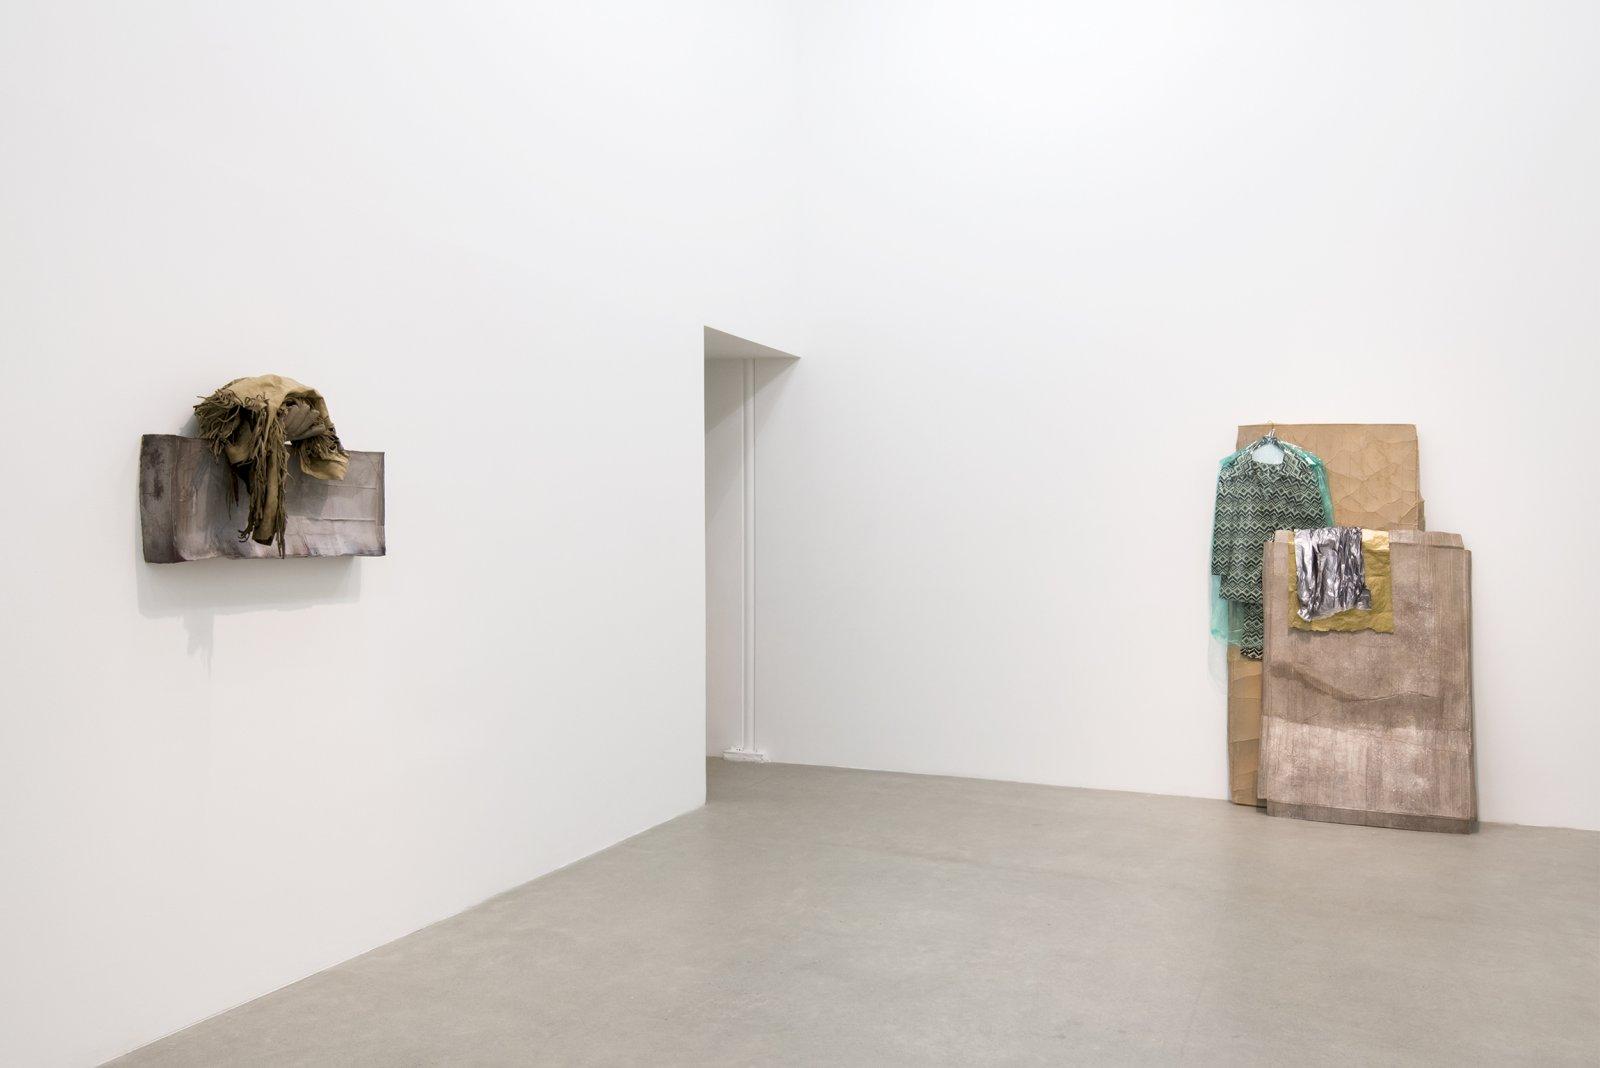 Liz Magor, installation view, Catriona Jeffries, 2016  by Liz Magor